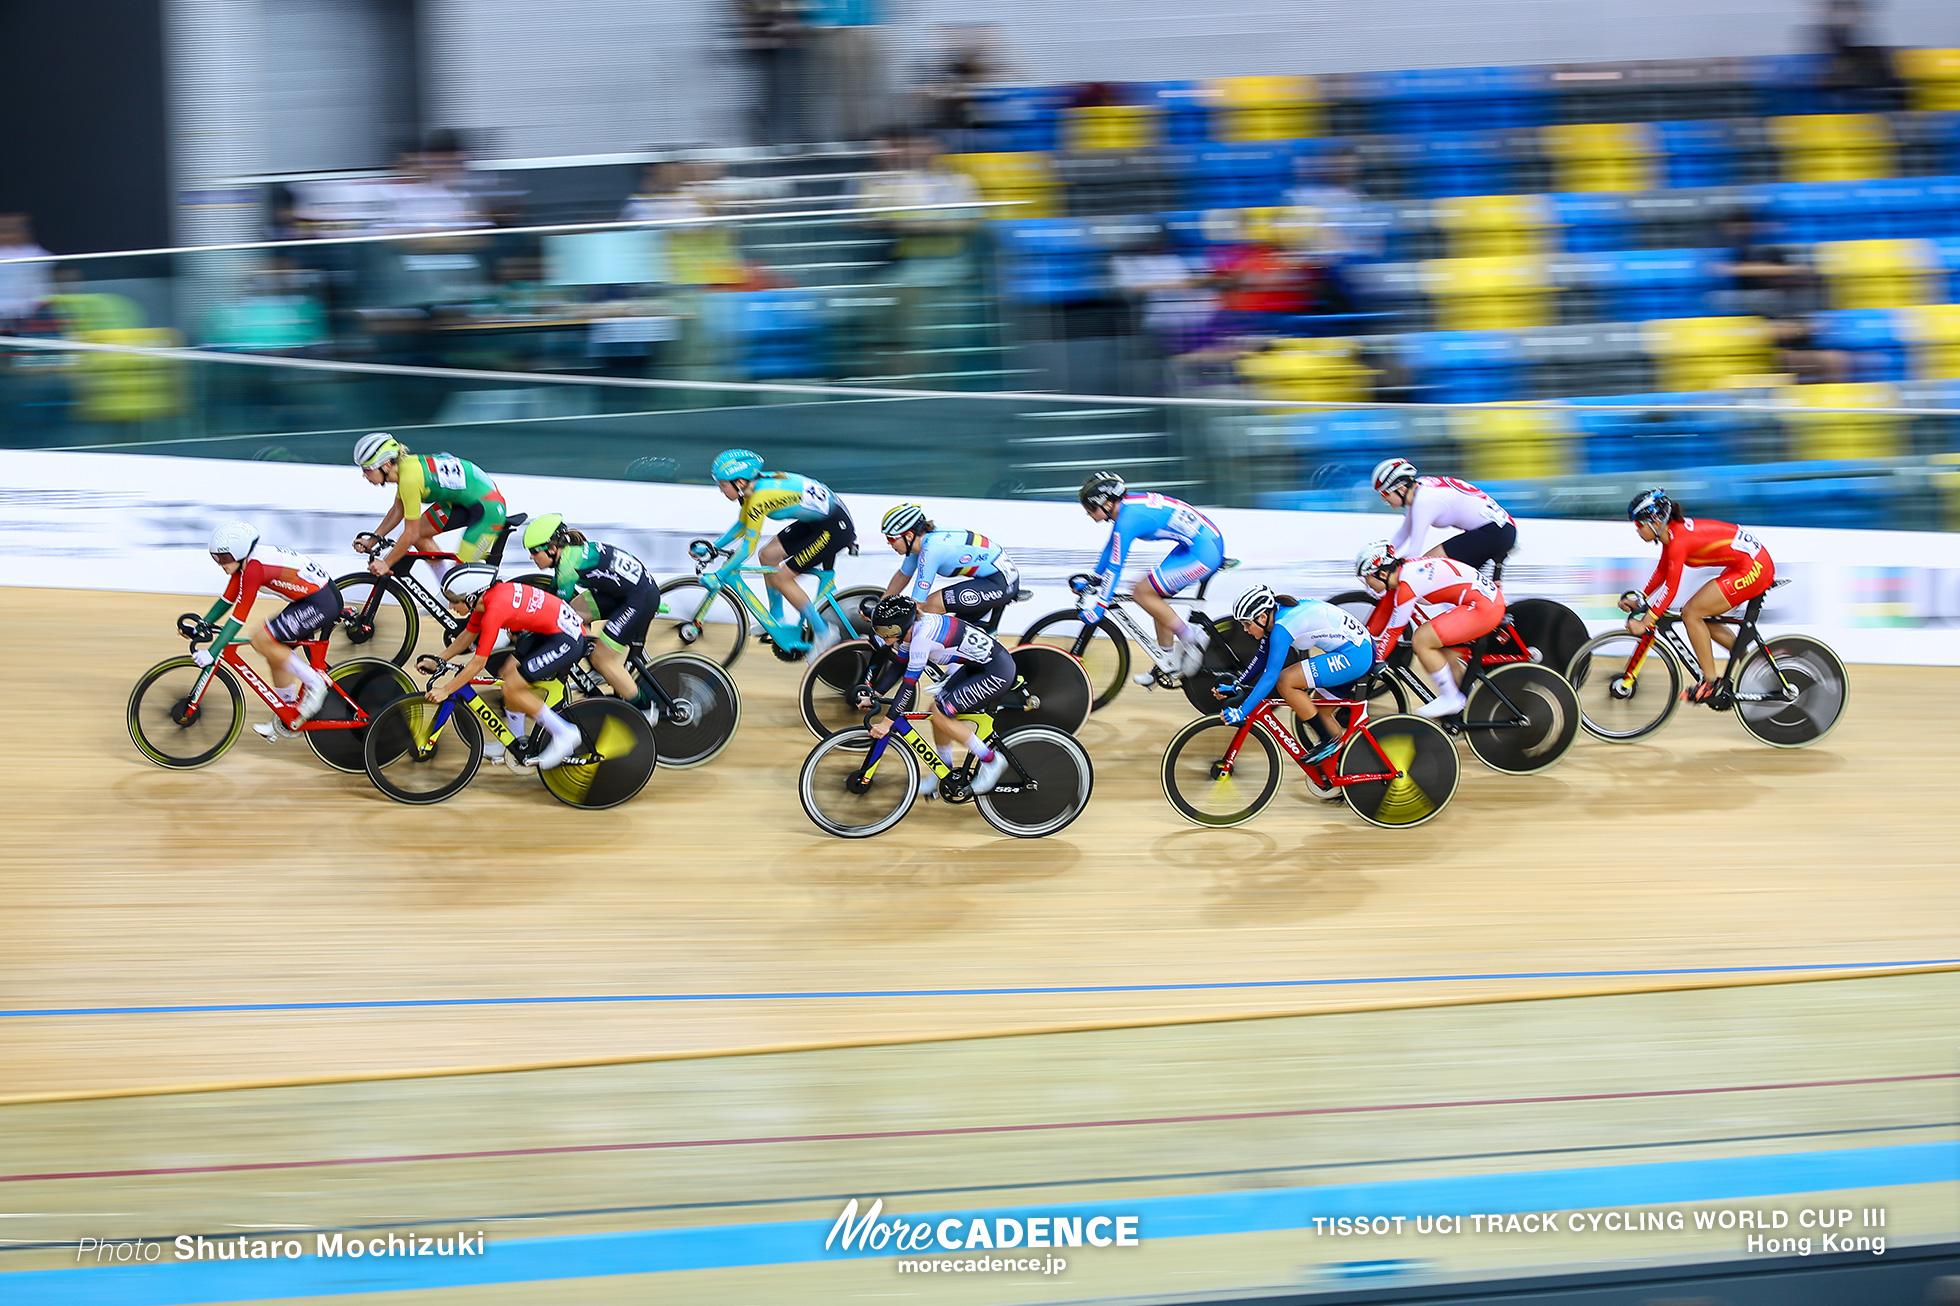 Qualifying / Women's Scratch Race / TISSOT UCI TRACK CYCLING WORLD CUP III, Hong Kong